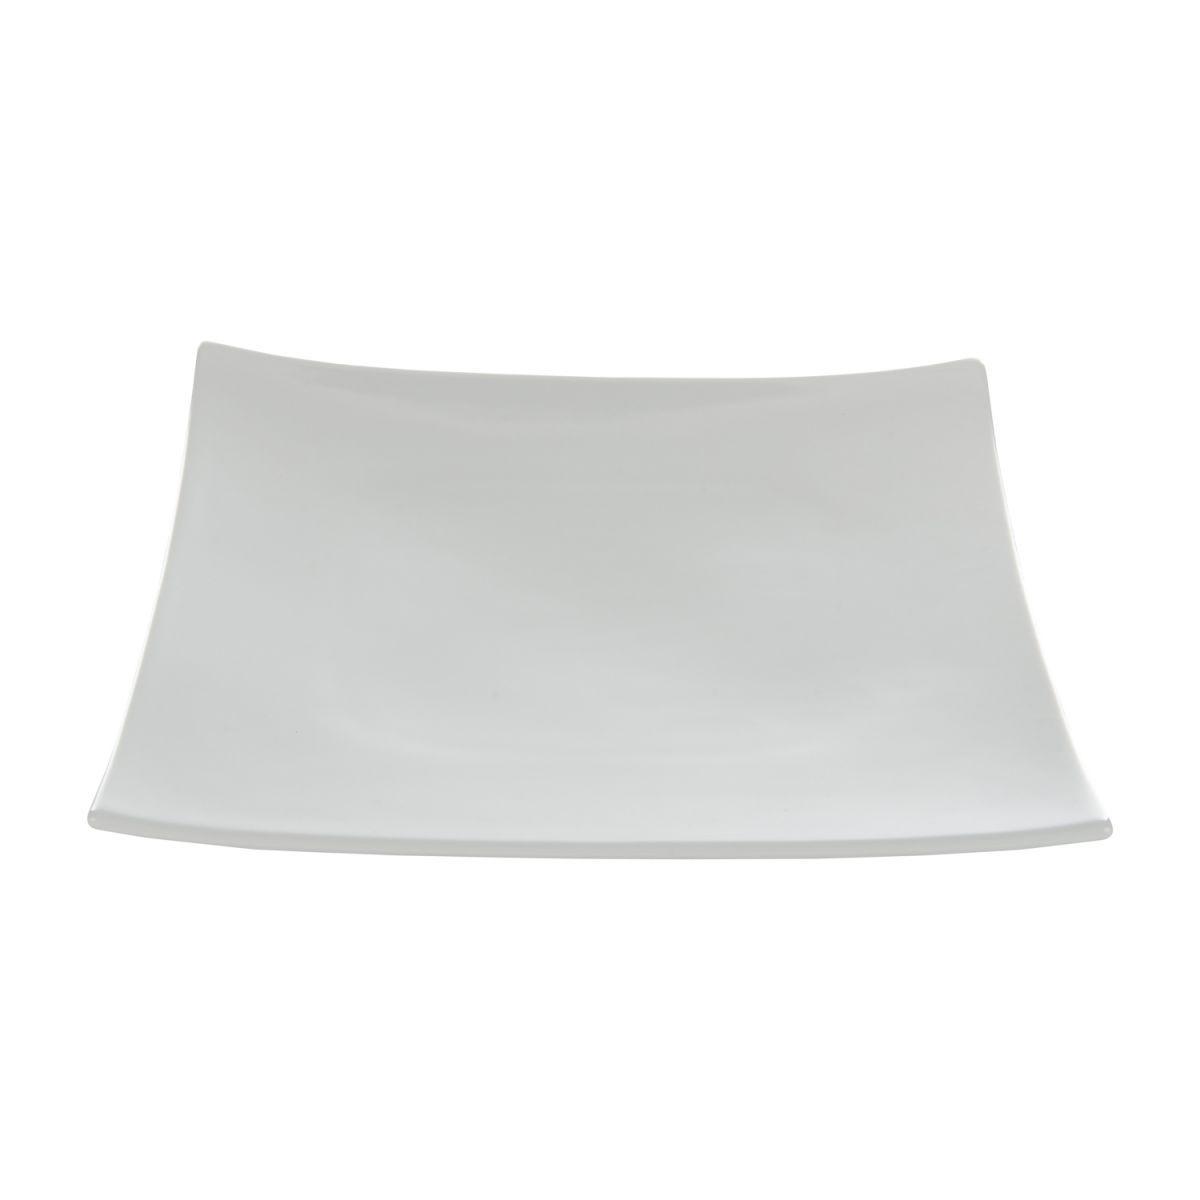 plate plain square 20 x 20 cm box6